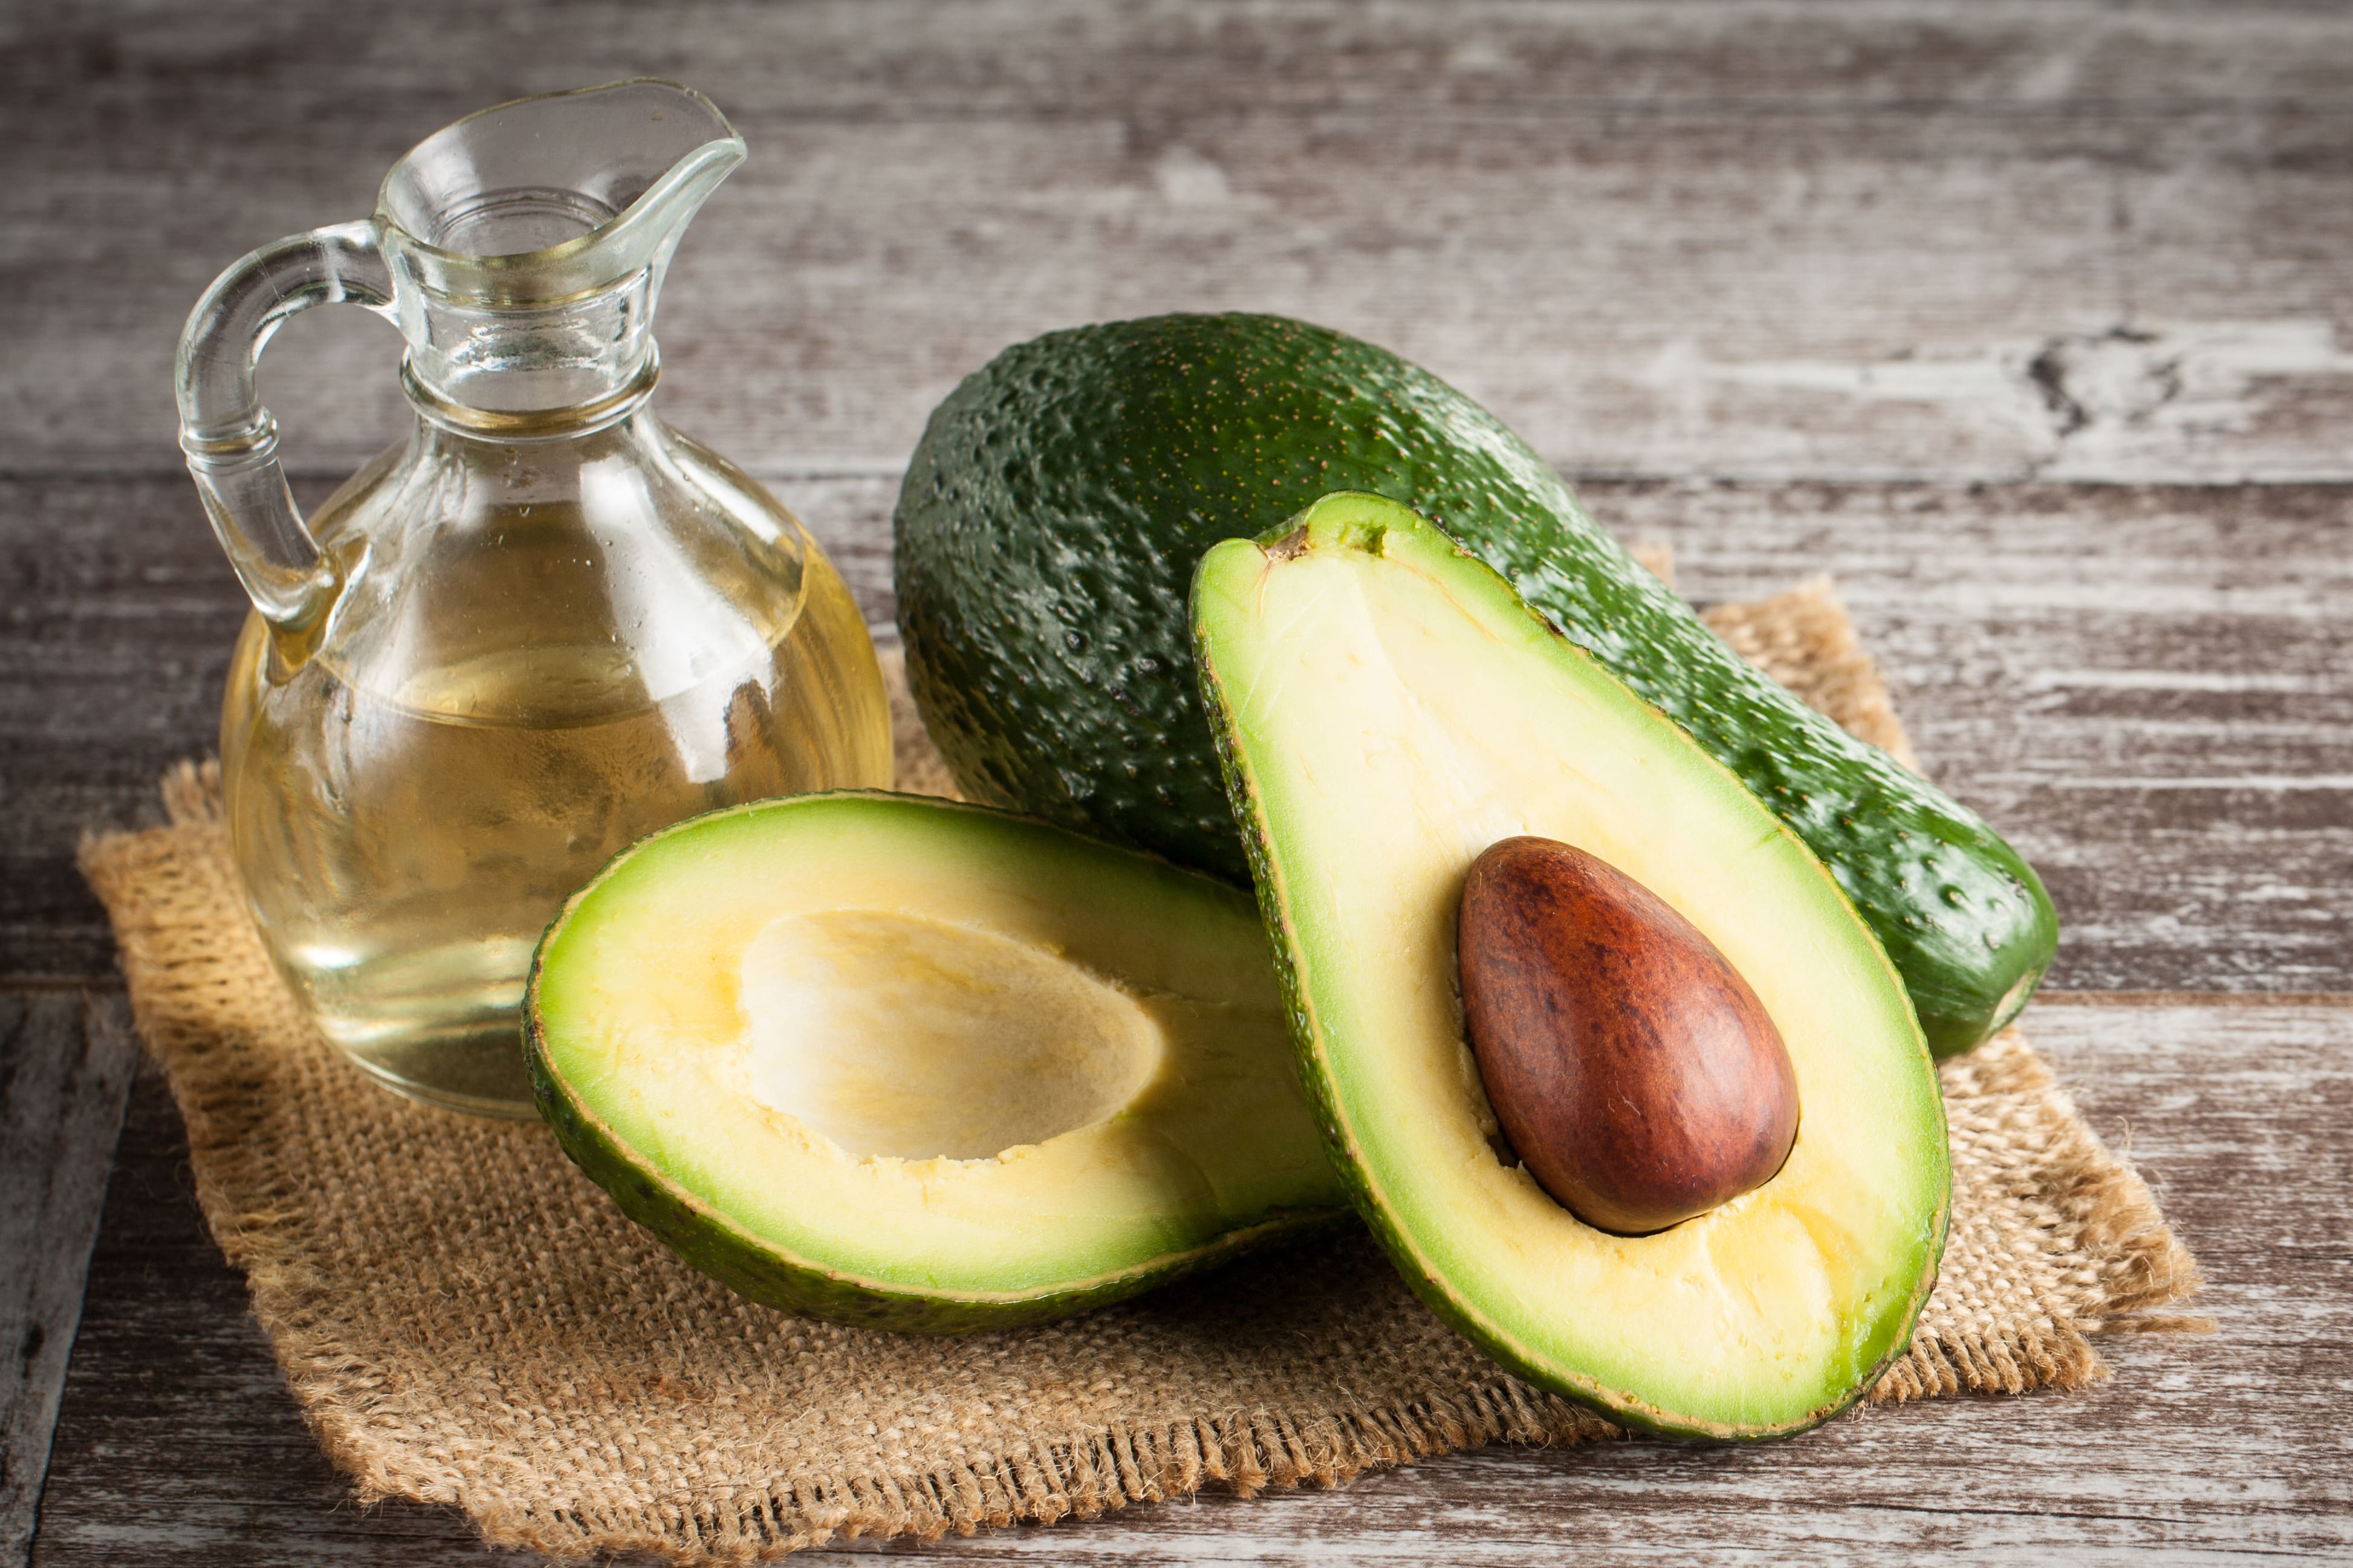 New Zealand Avocado Oil Permeates Australia - Tridge